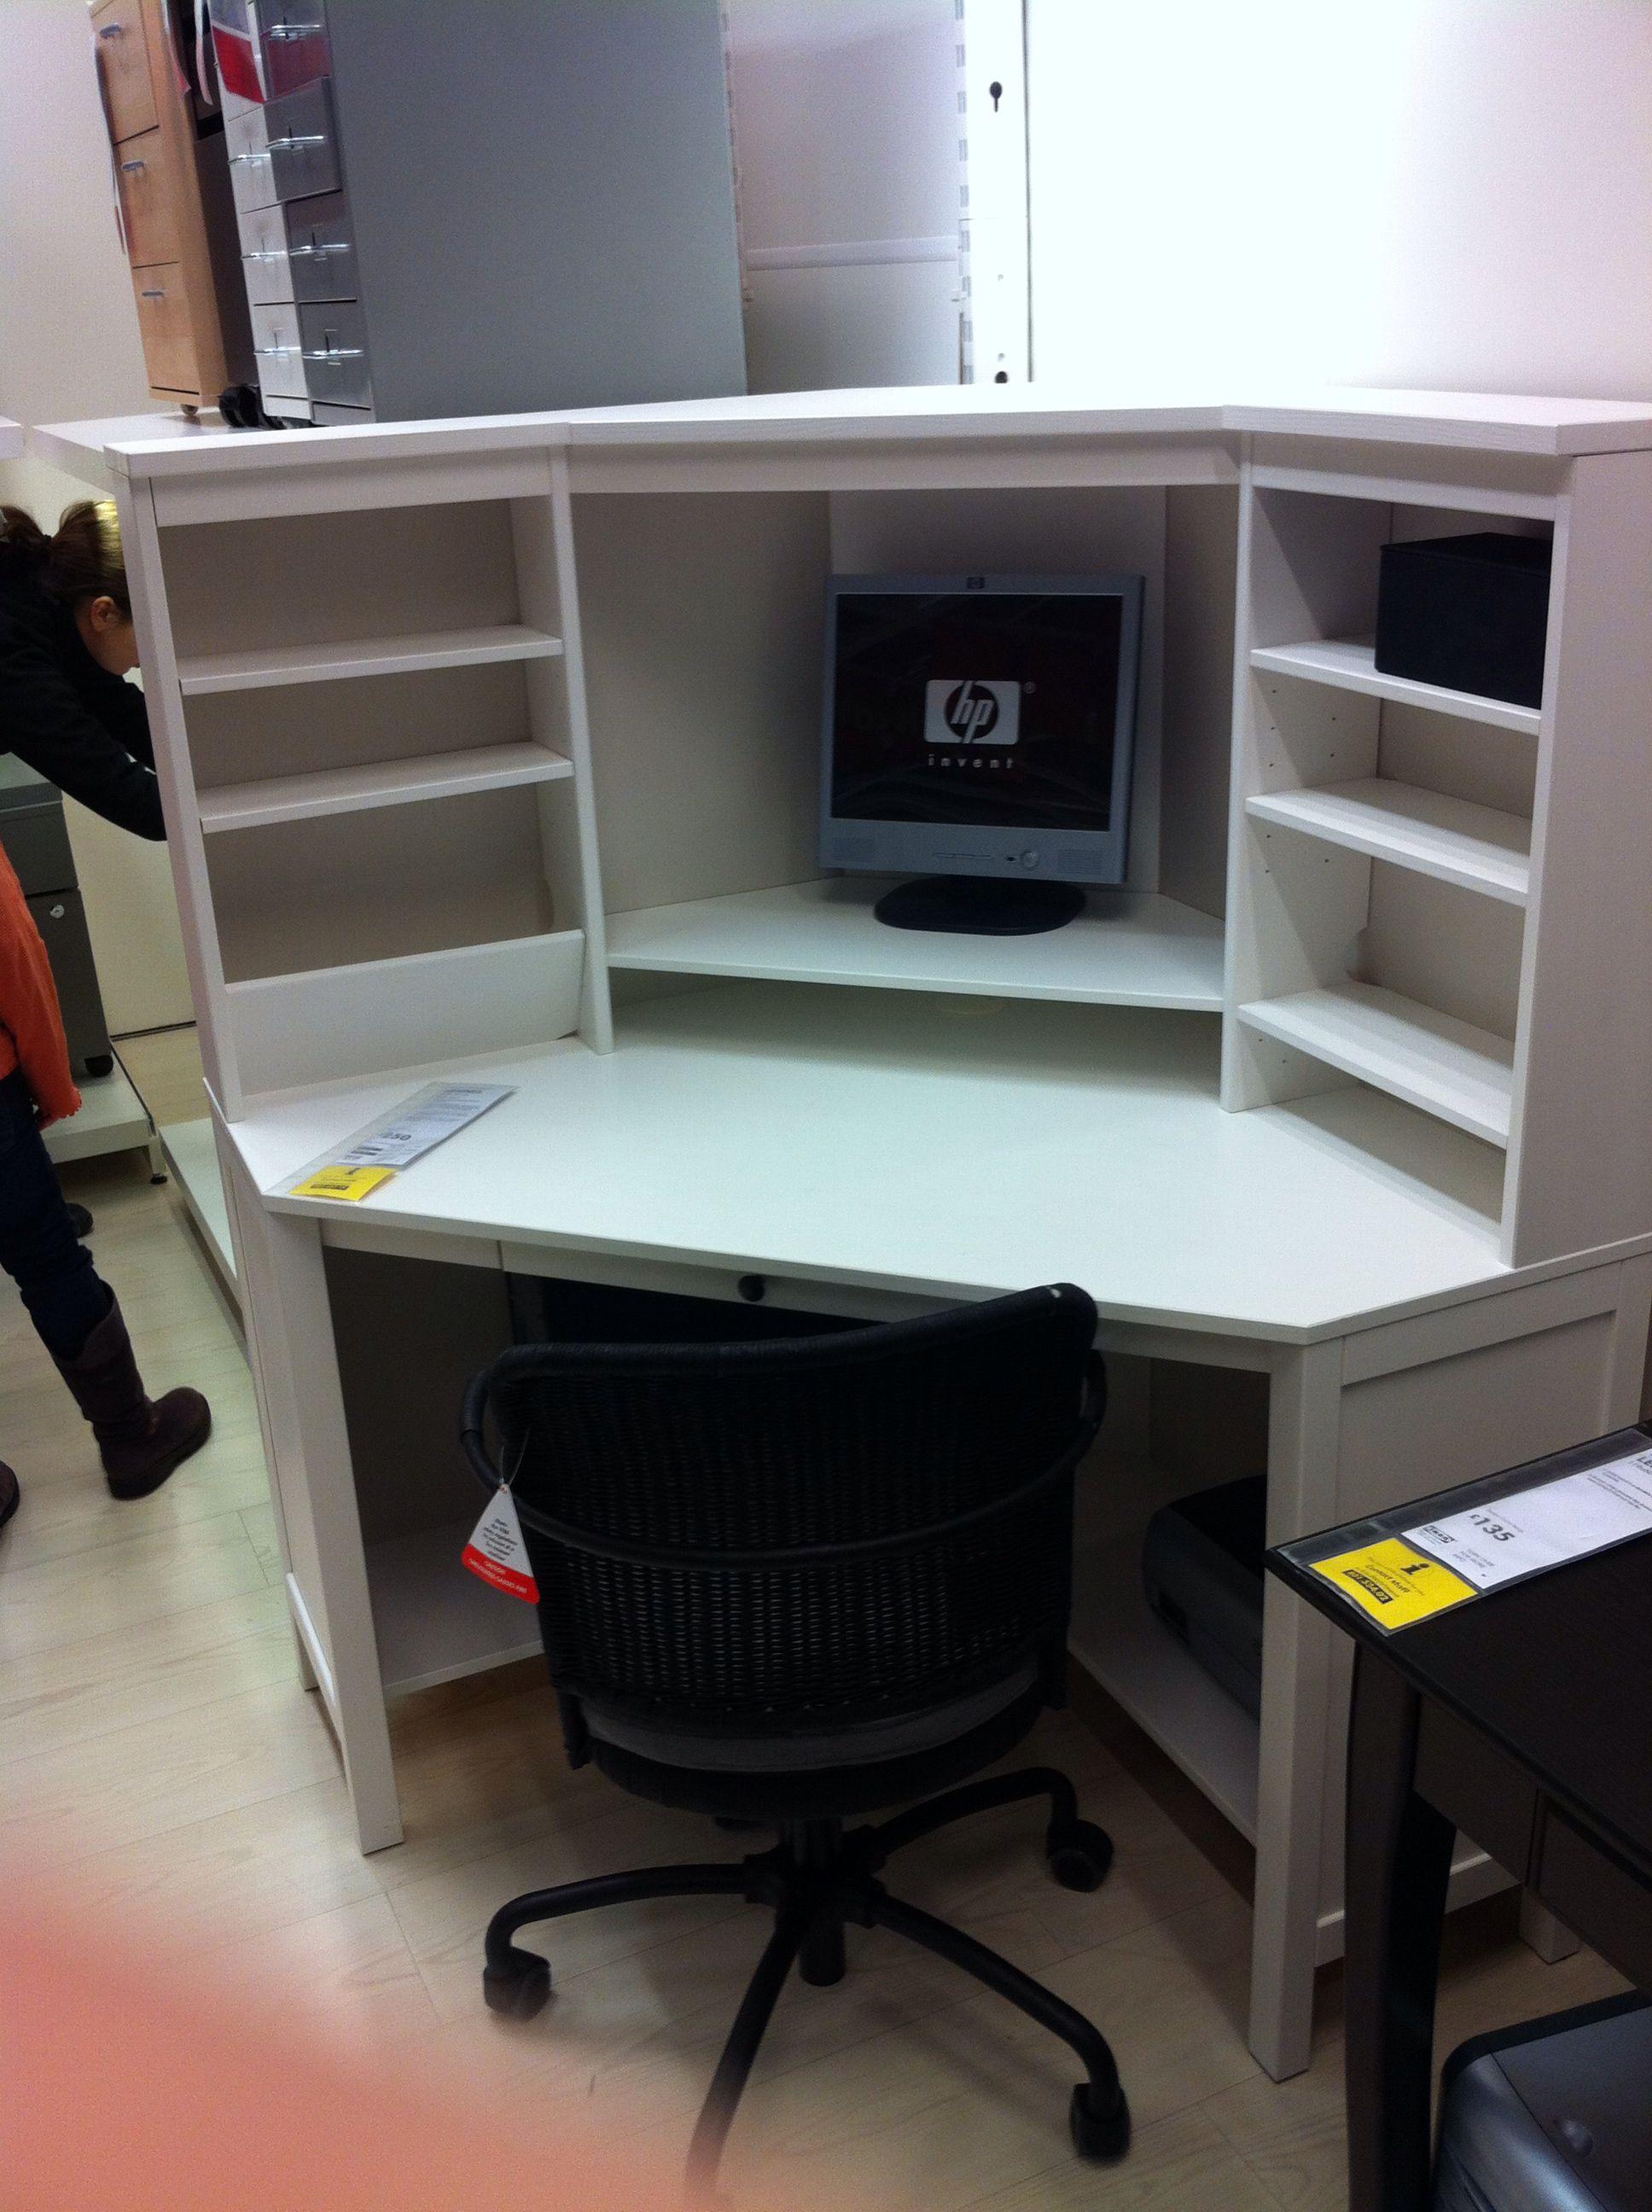 ikea hemnes corner desk corner desk ikea corner desk desk corner desk. Black Bedroom Furniture Sets. Home Design Ideas